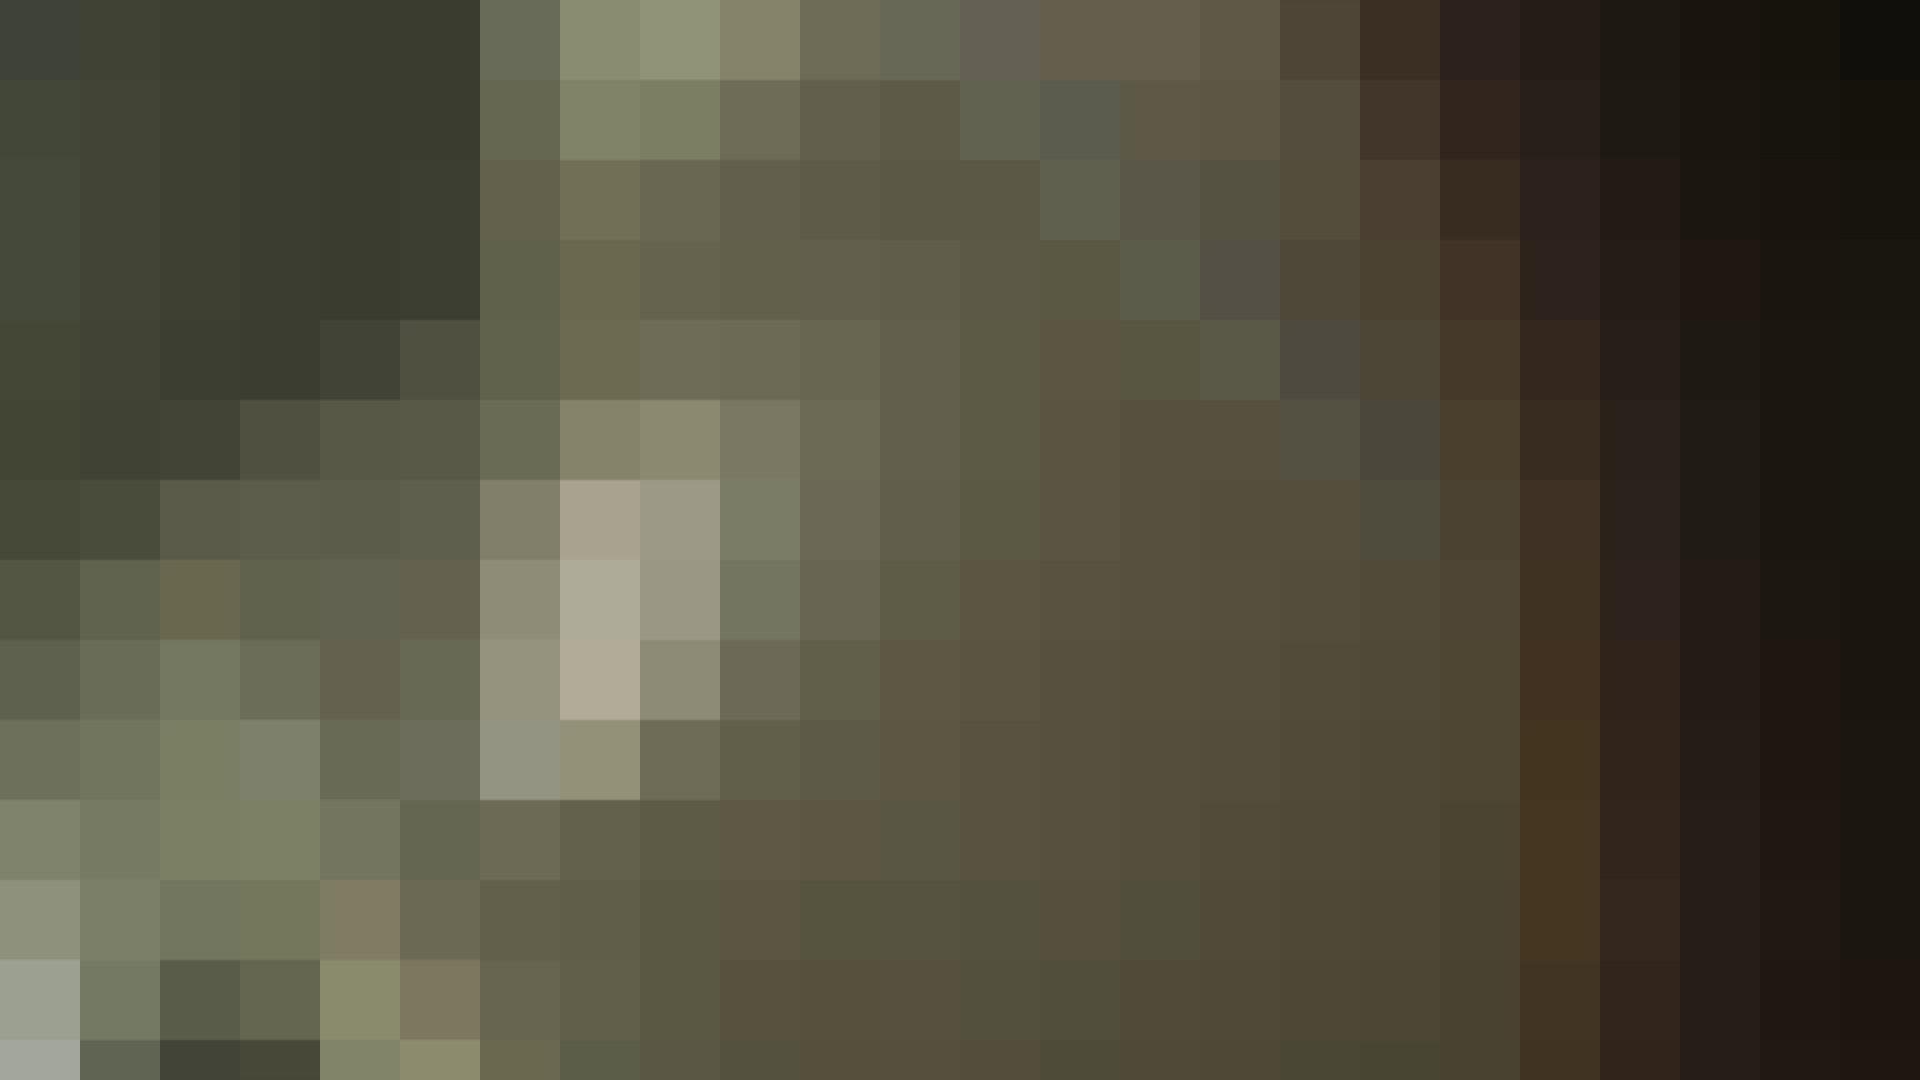 vol.25三十時間潜り、一つしか出会えない完璧桃尻編 byお銀 美人の裸体 おまんこ動画流出 106枚 71